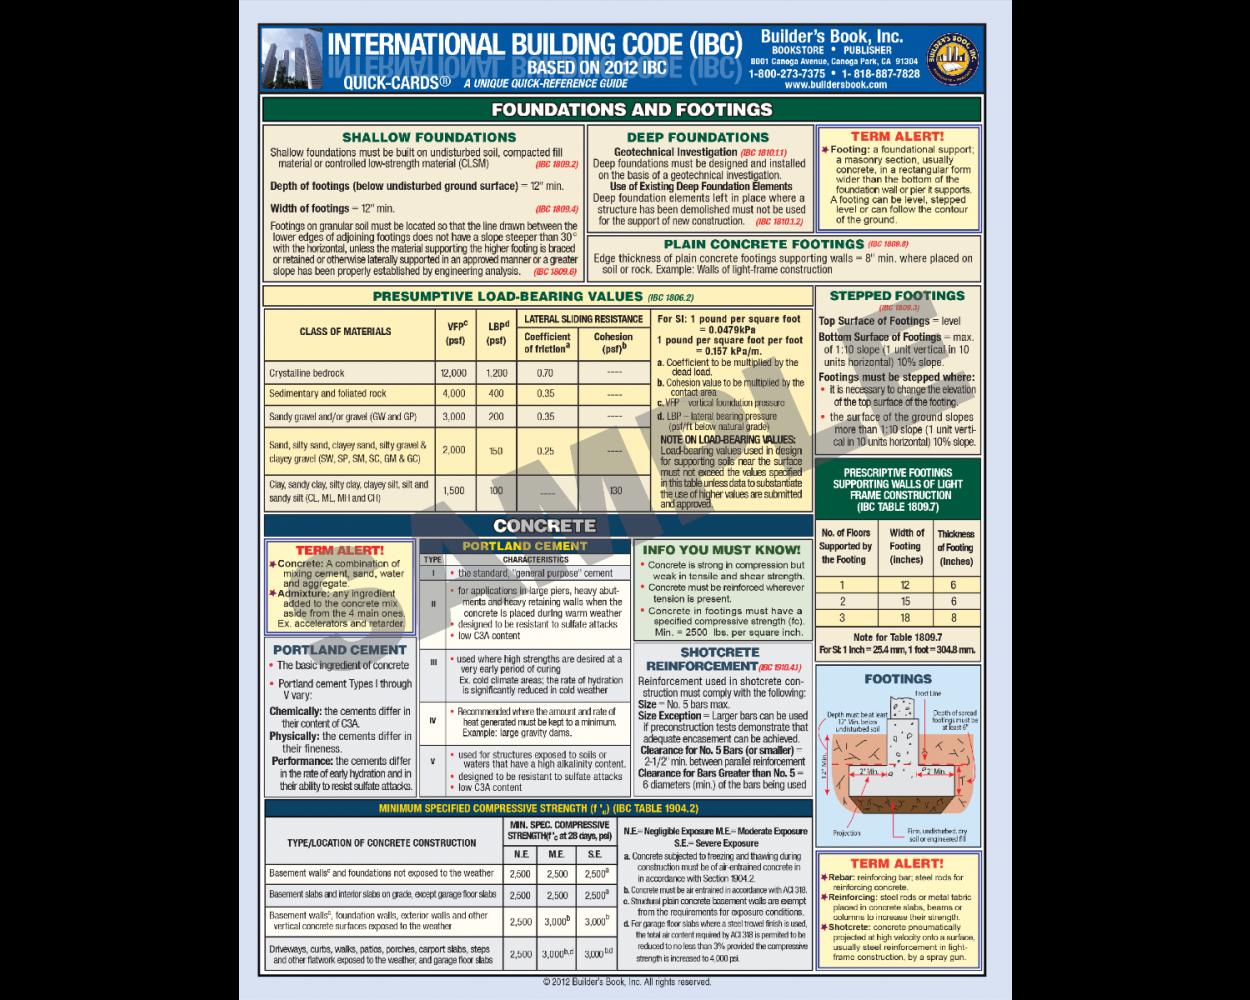 2012 International Building Code